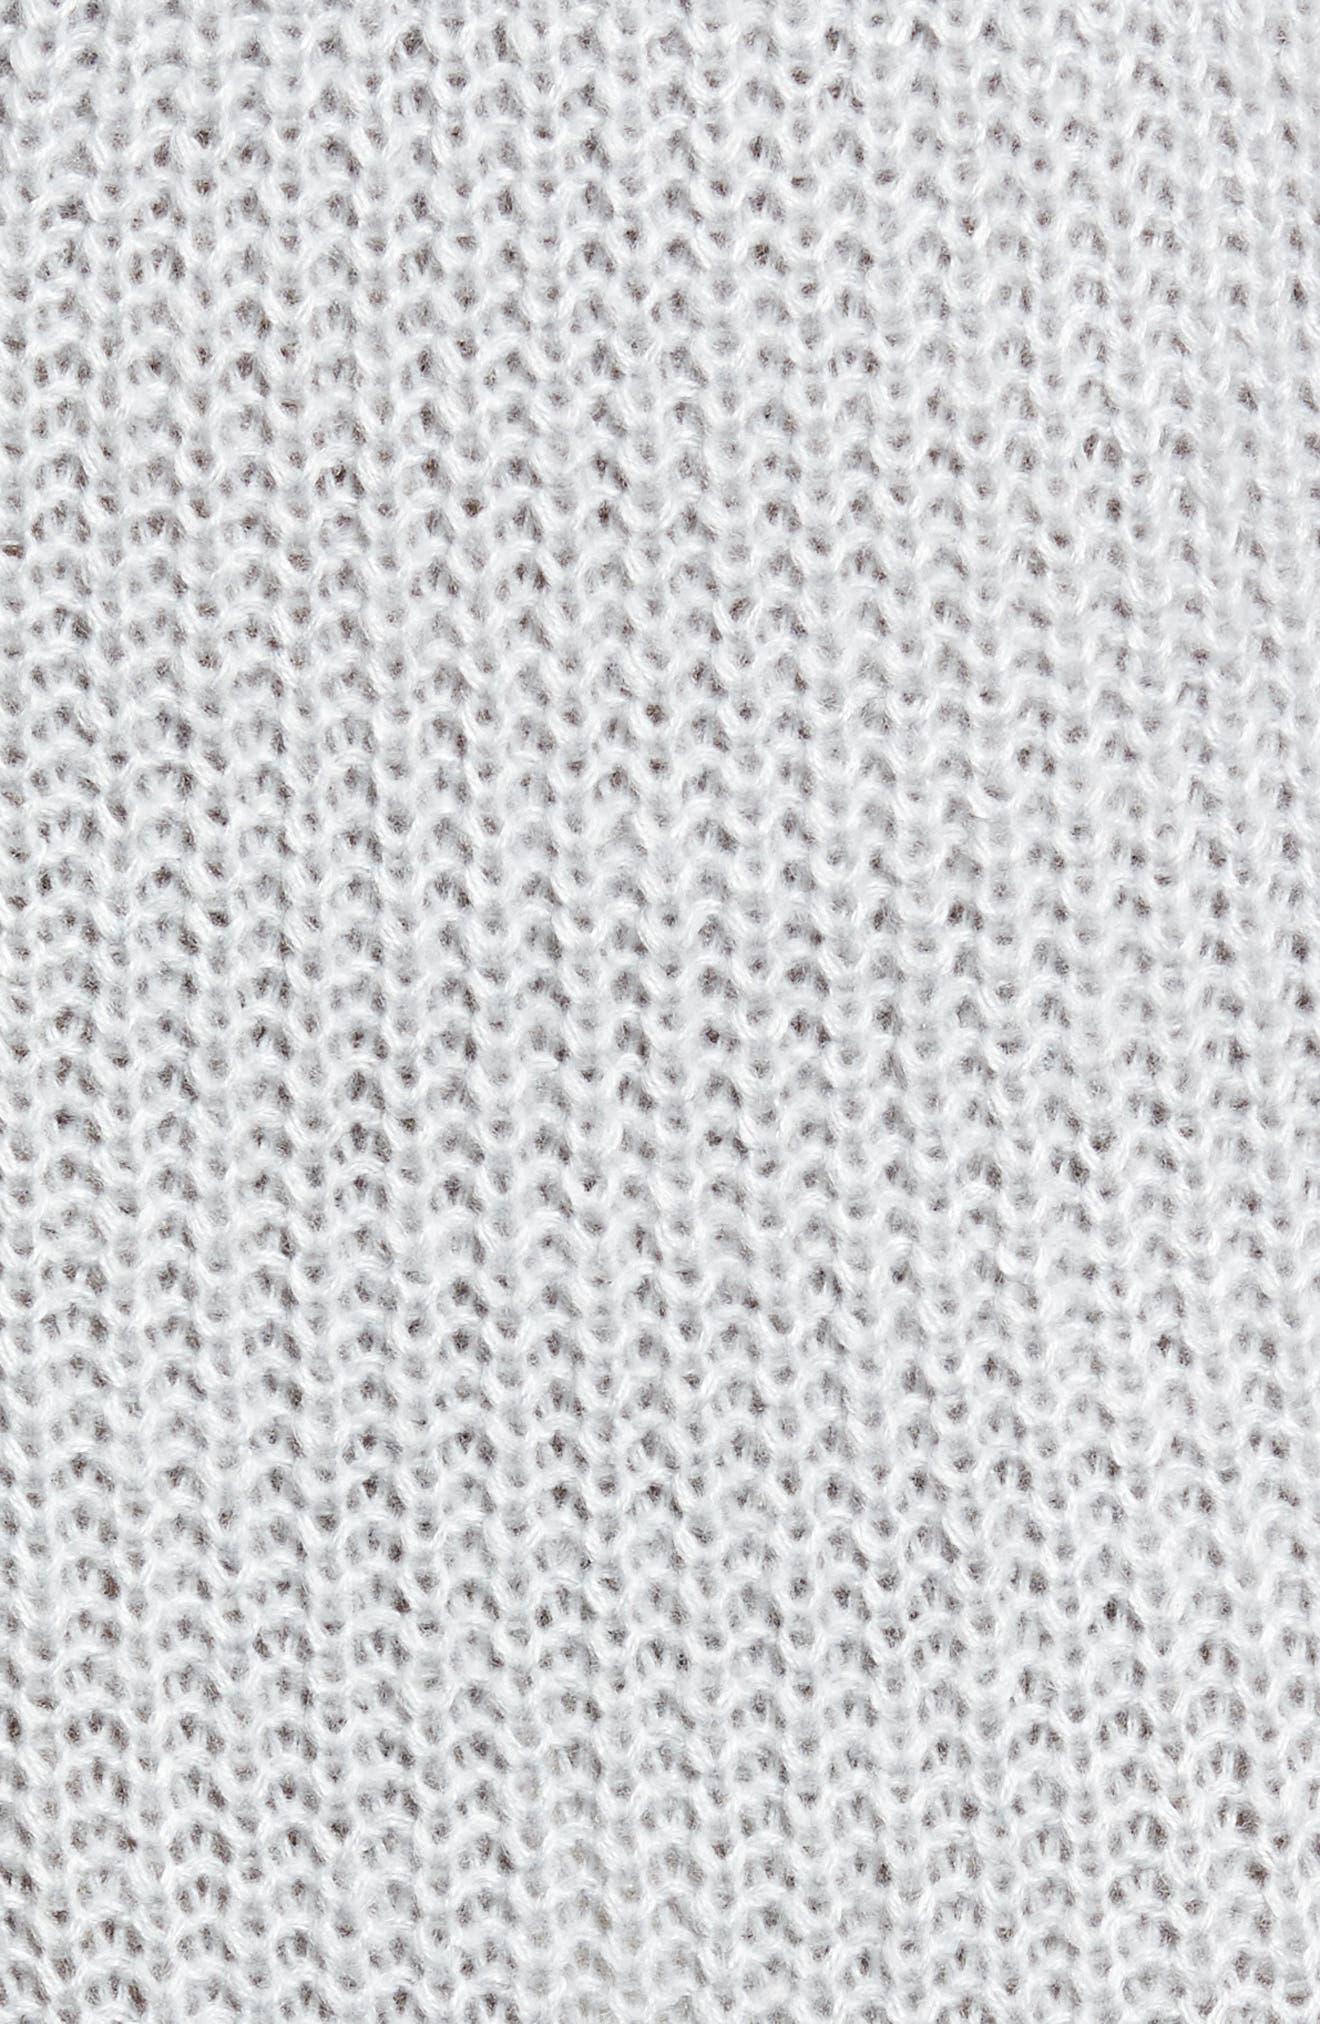 Foldover Off the Shoulder Sweater Dress,                             Alternate thumbnail 18, color,